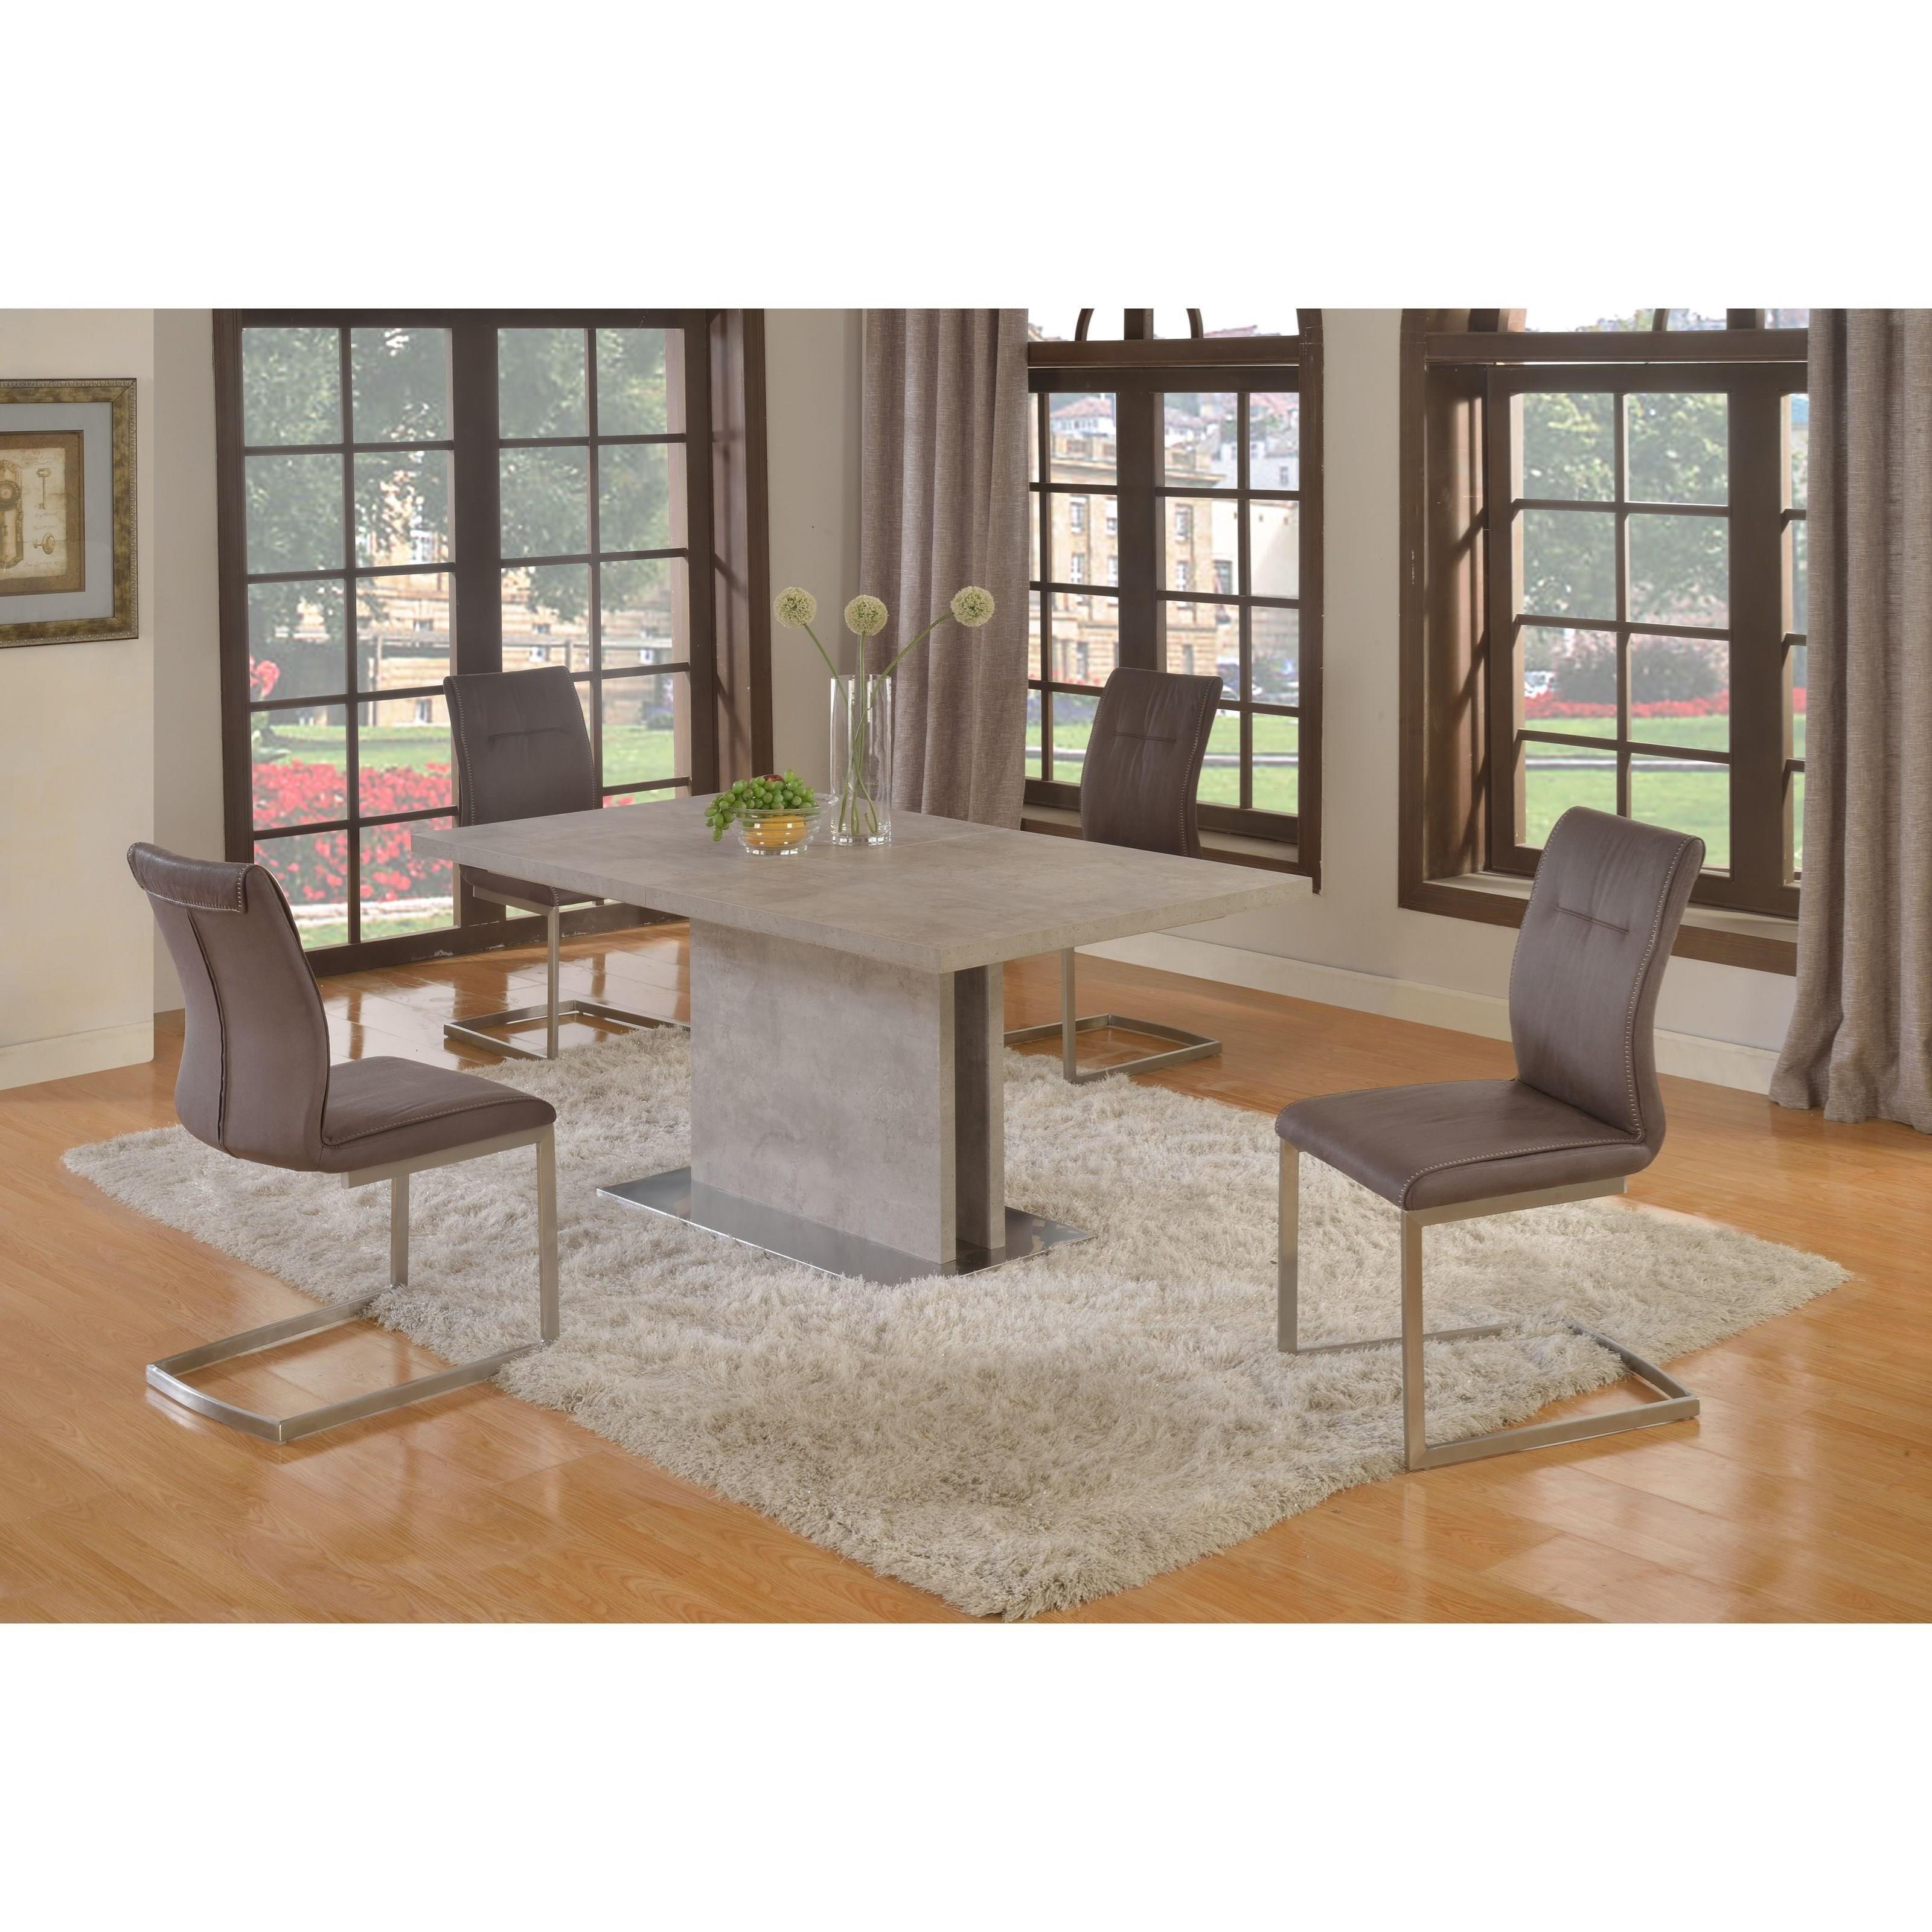 Kalinda 5 Piece Set by Chintaly Imports at Darvin Furniture